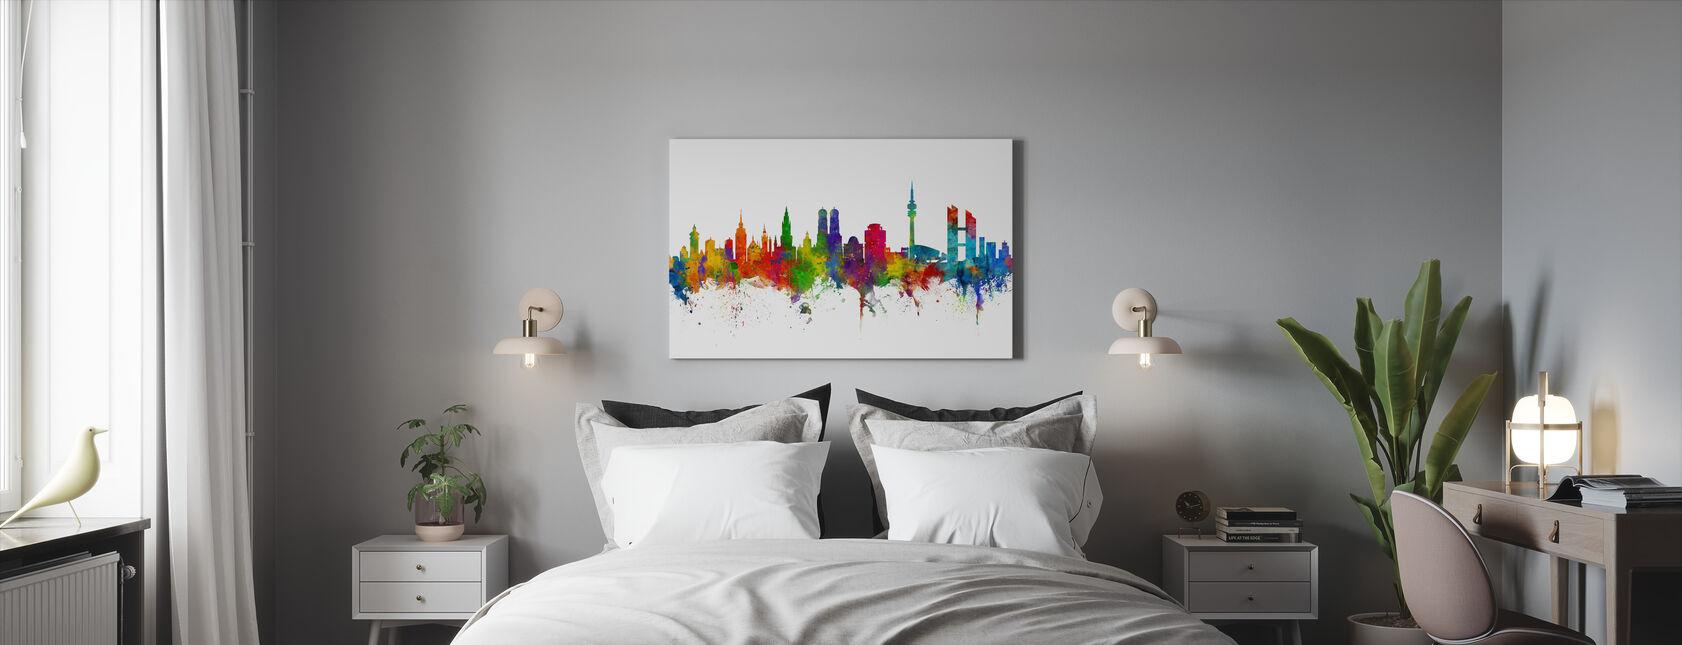 Skyline van München - Canvas print - Slaapkamer